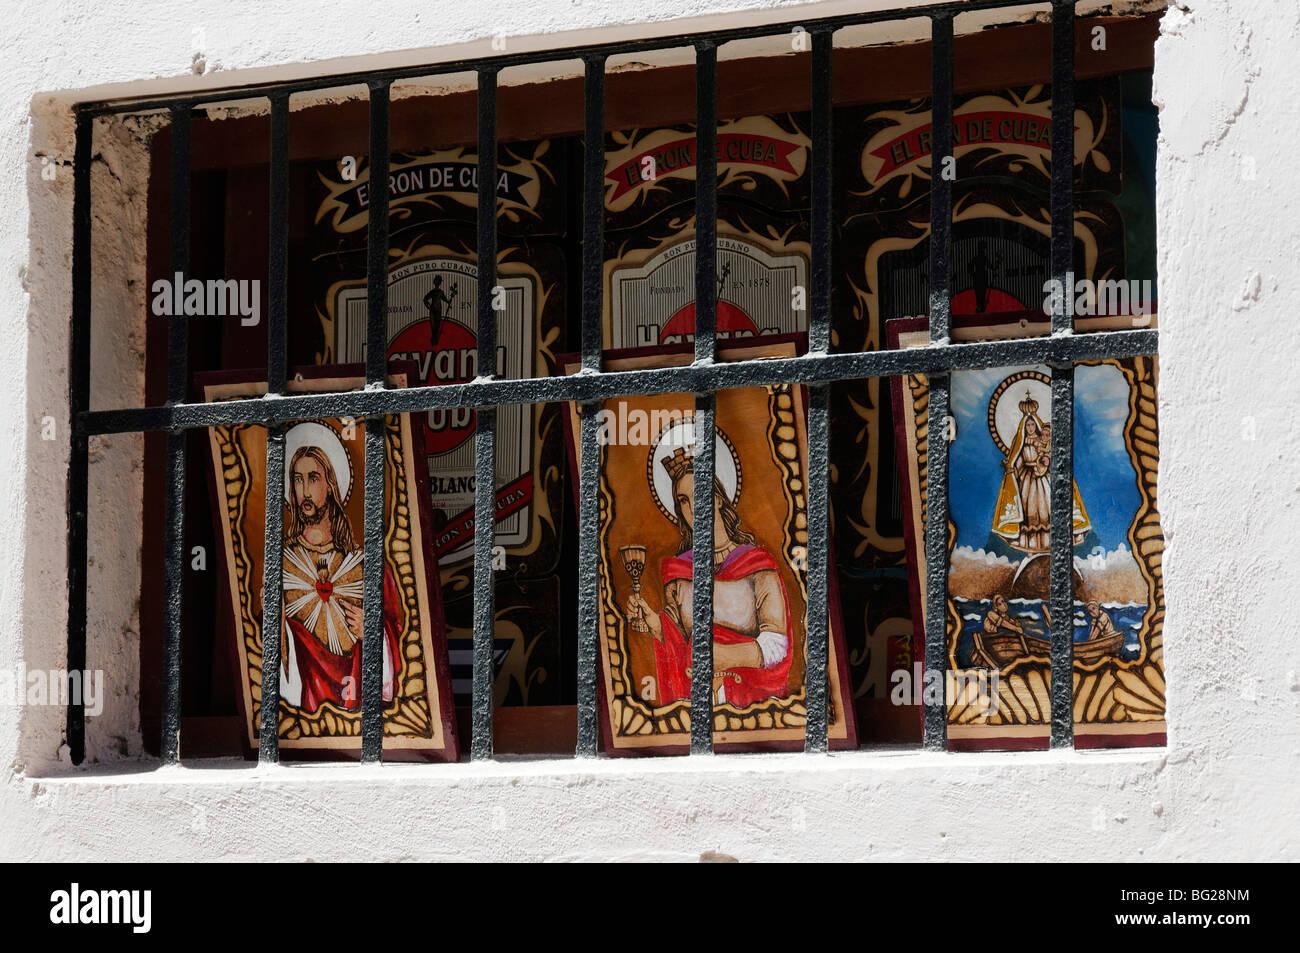 Christian iconography, Havana, Cuba - Stock Image